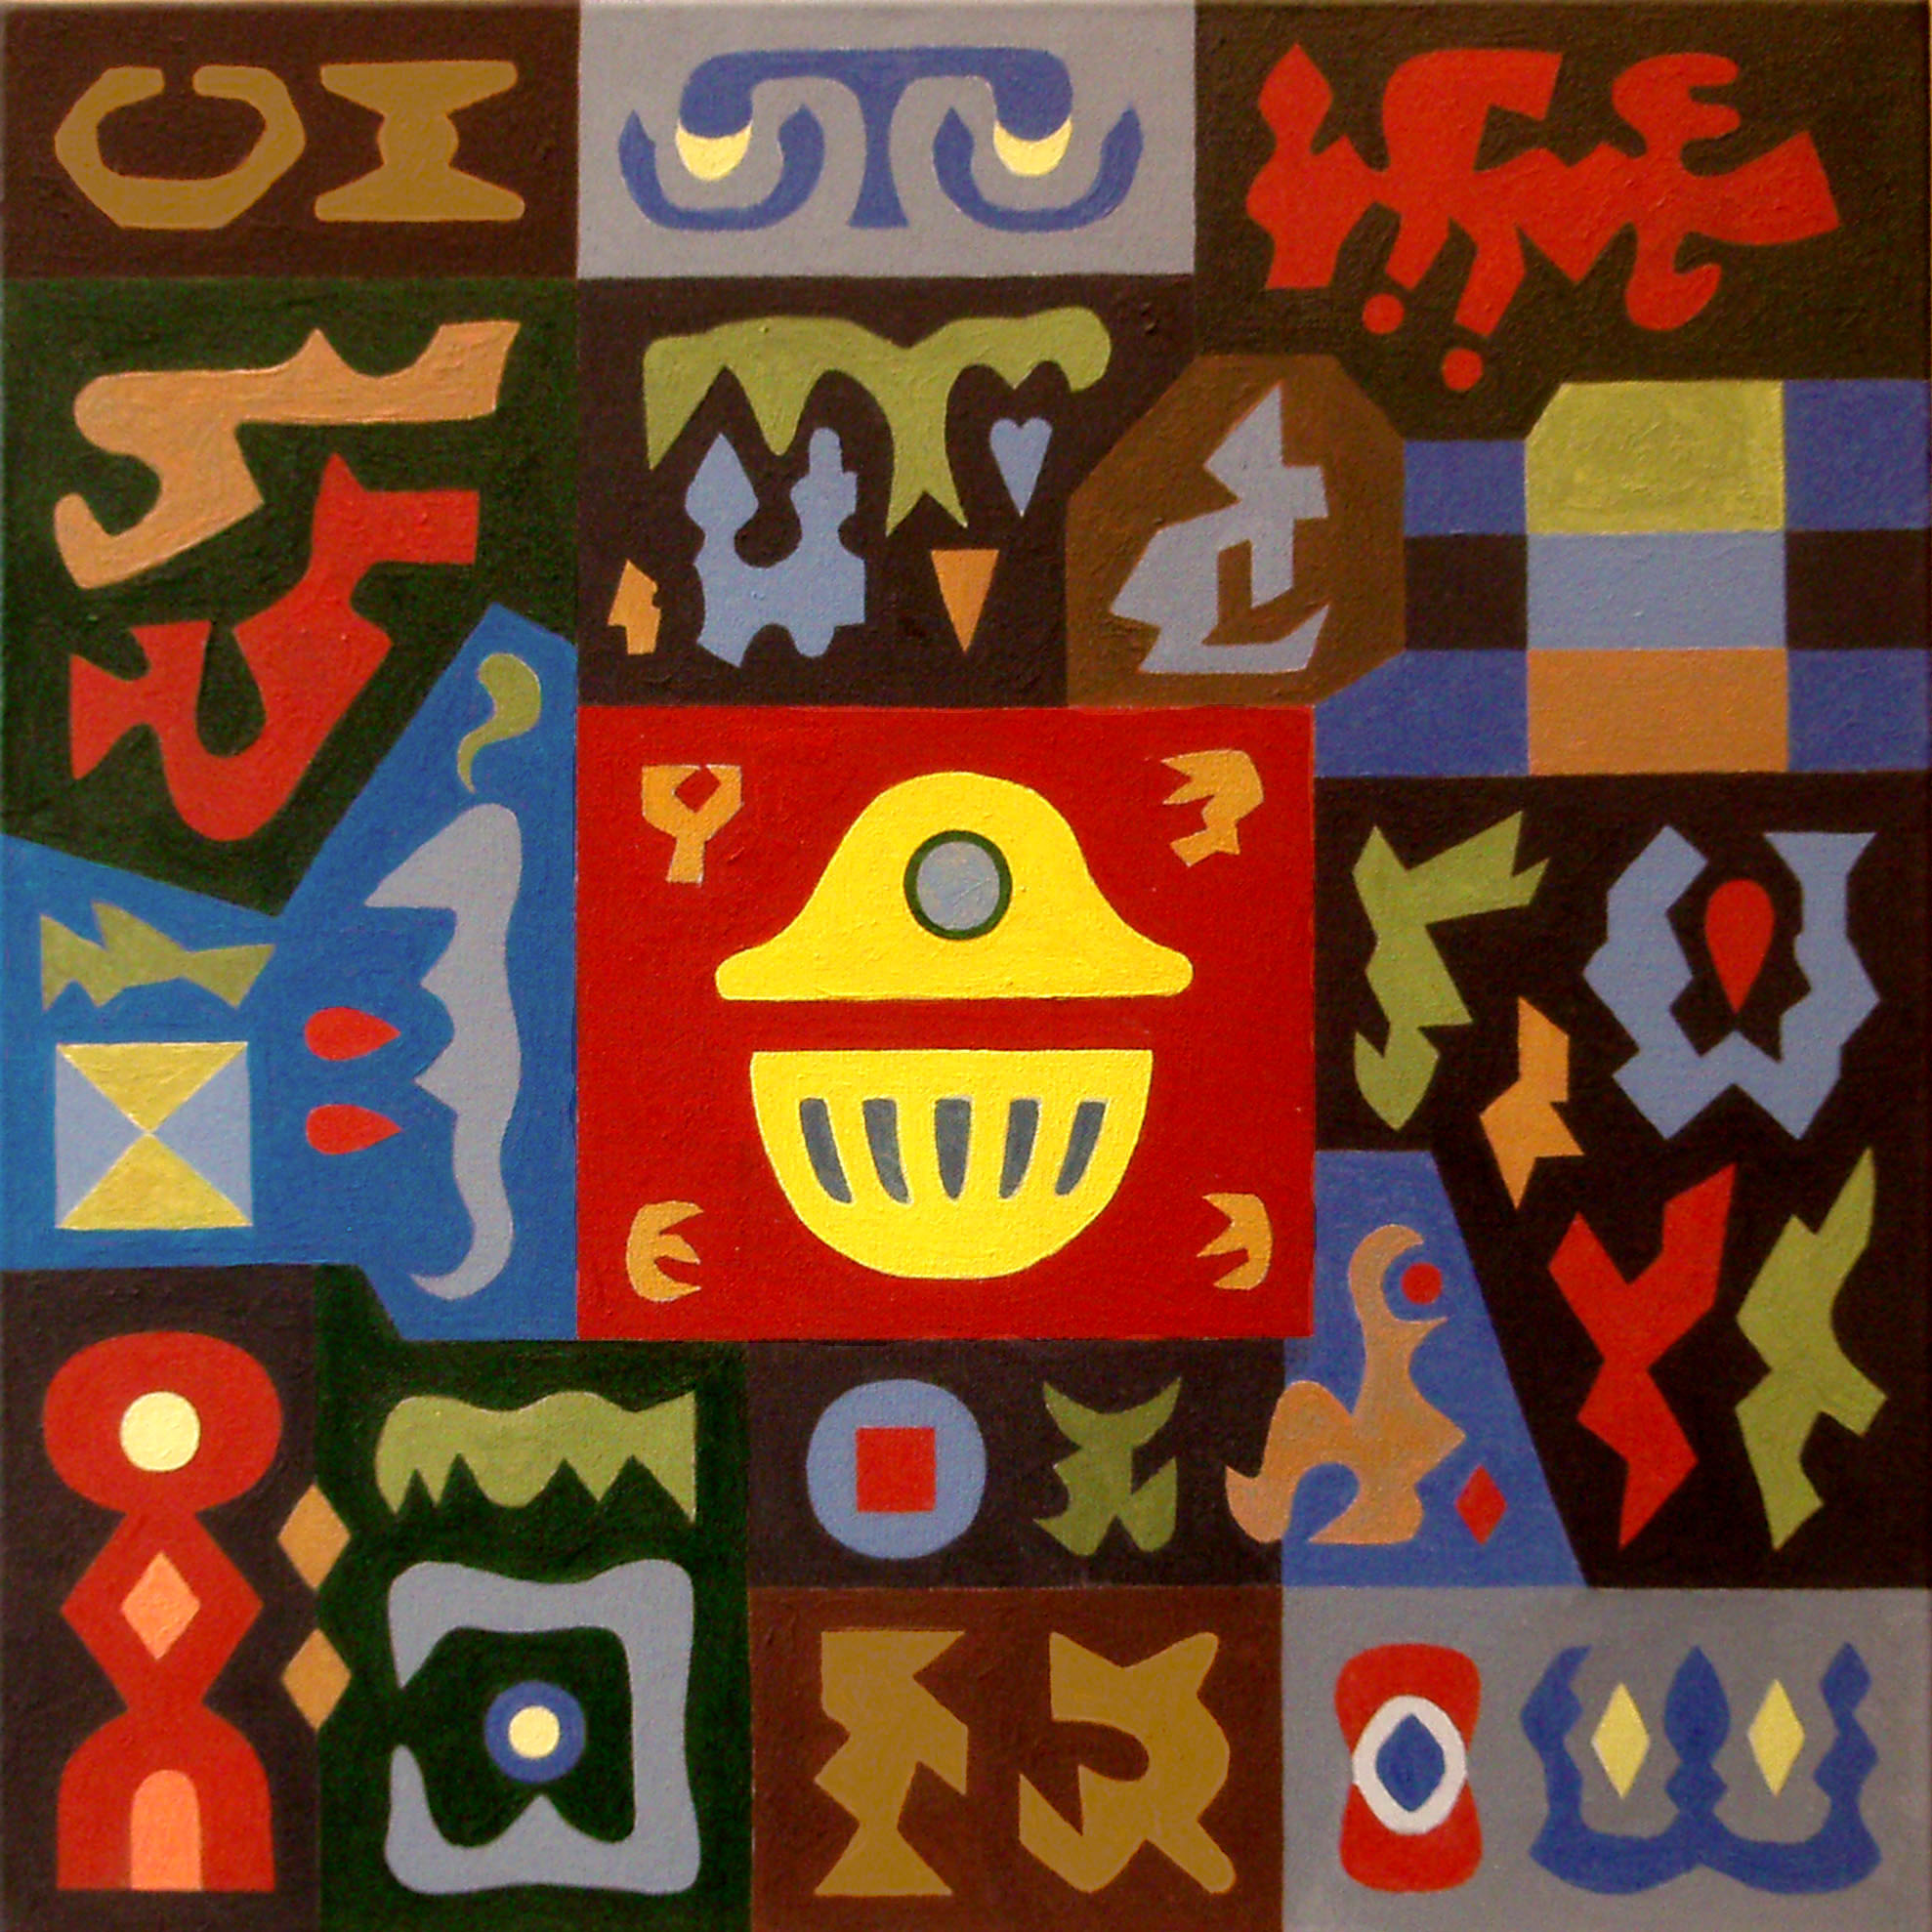 PUZLE COLORISTA (2010) - Ramiro Tapia